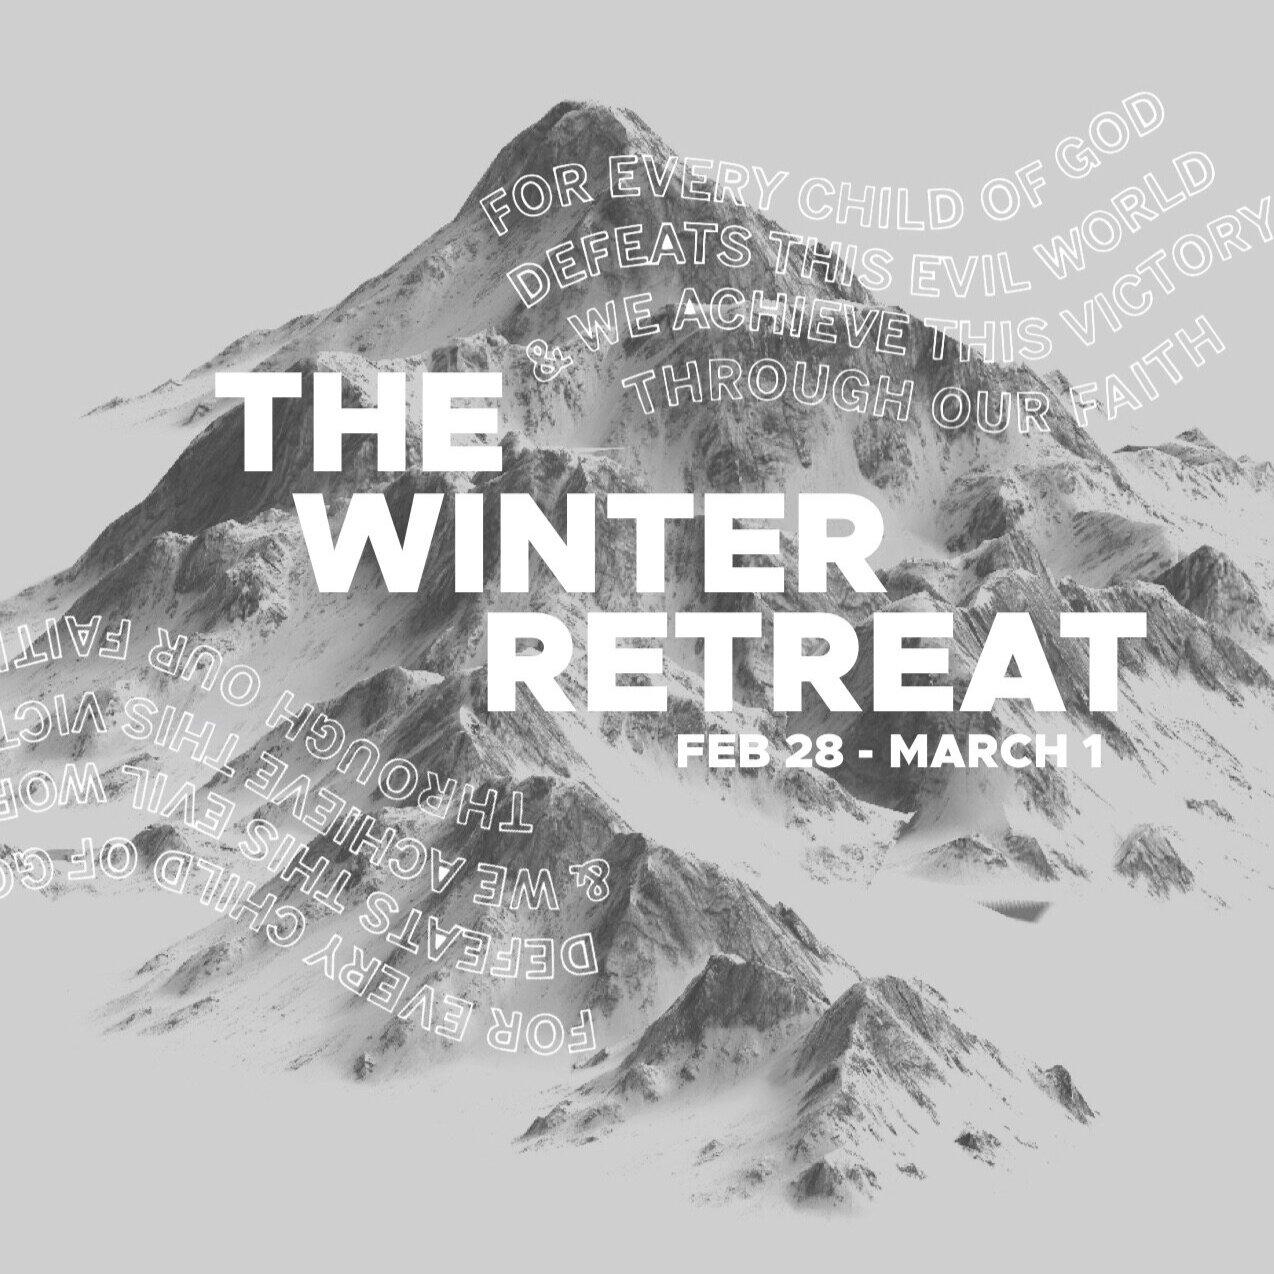 Winter+Retreat+2020+p1.jpg